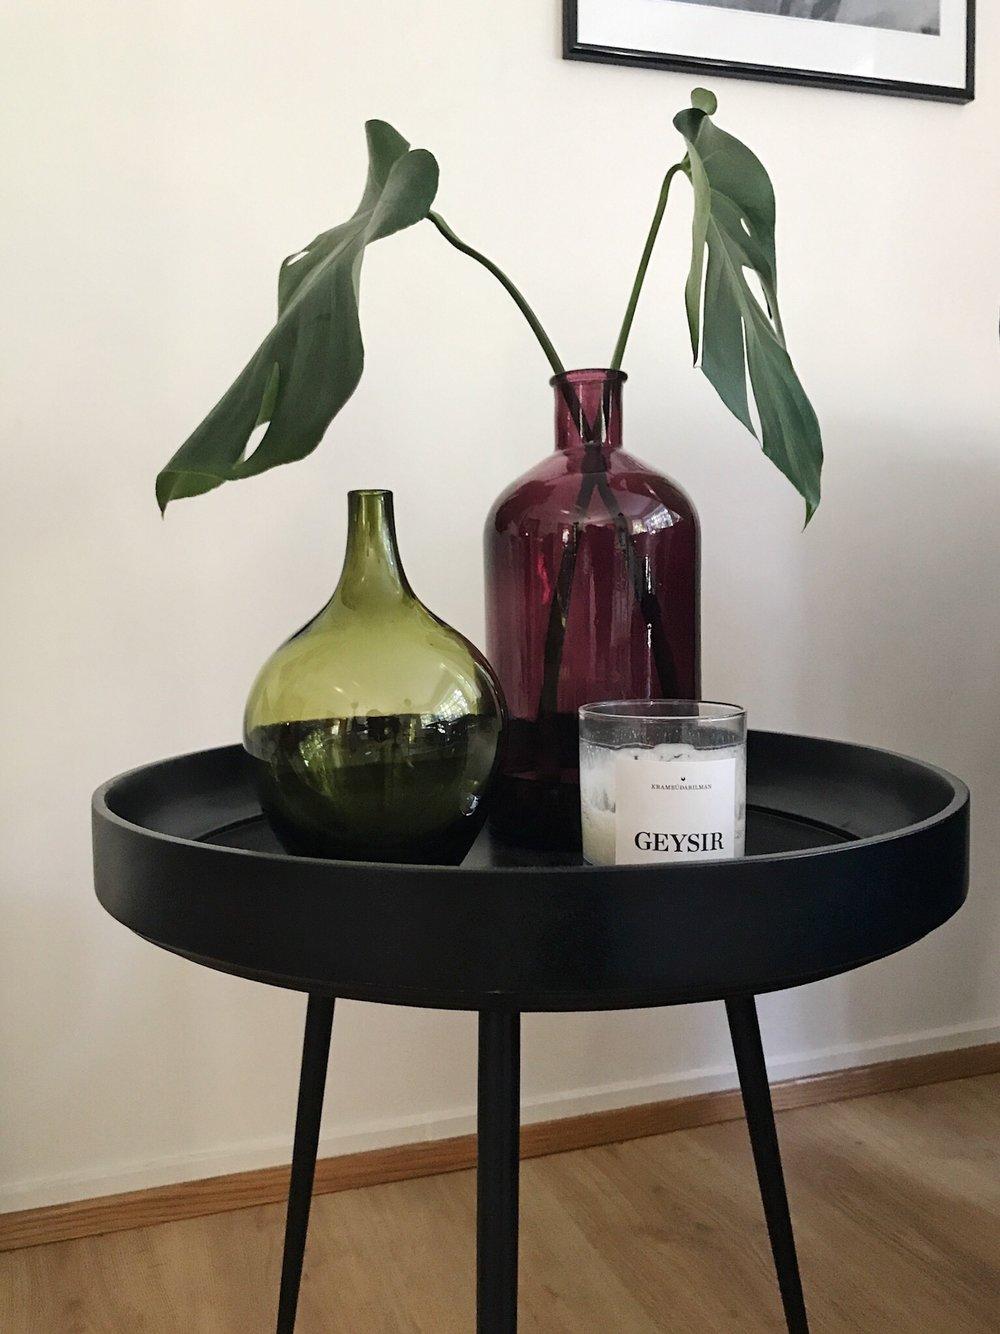 reykjavik-home-bjorg-mater-table-geysir-candle-vase-monstera